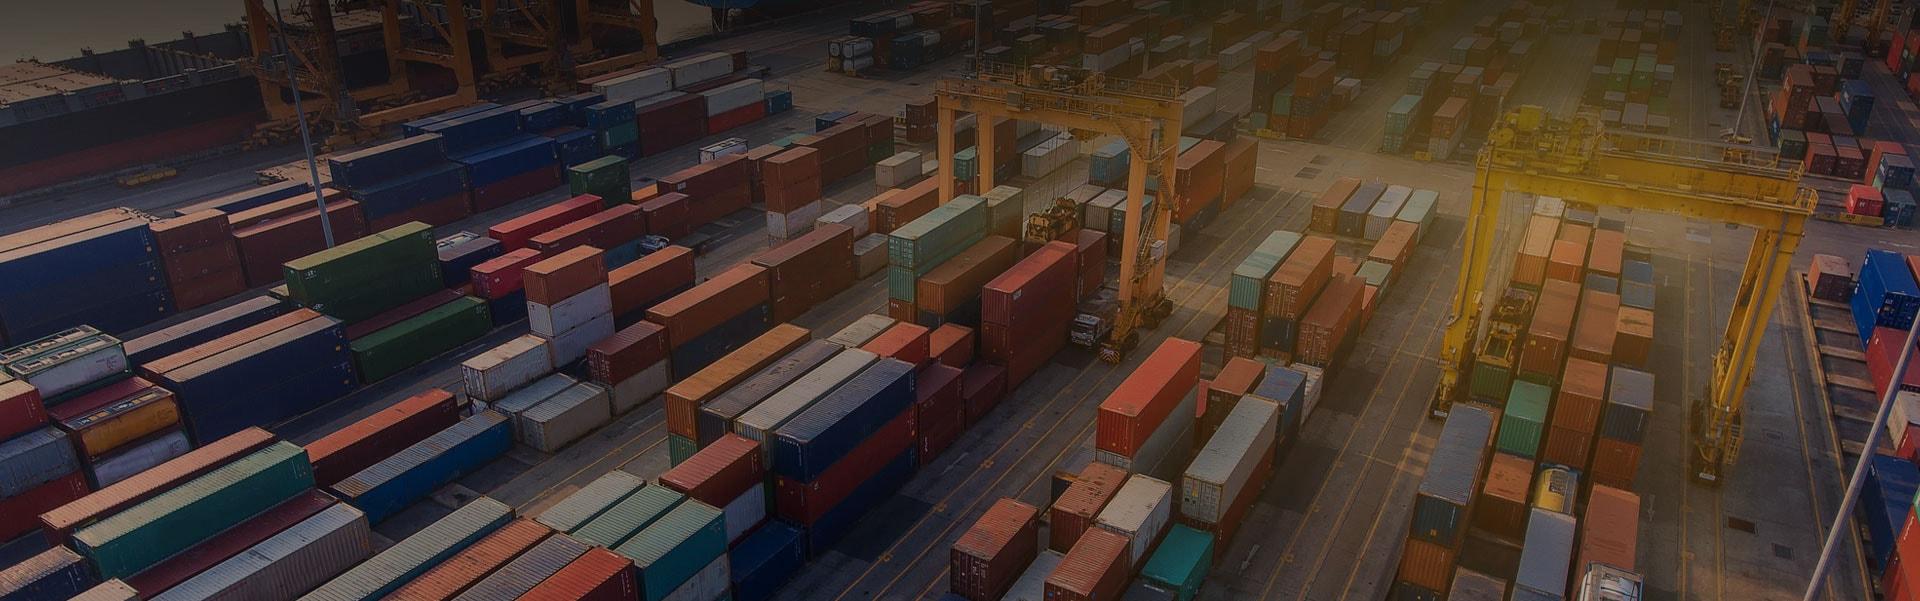 BNSF Applies Intermodal Container Terminal Simulation and